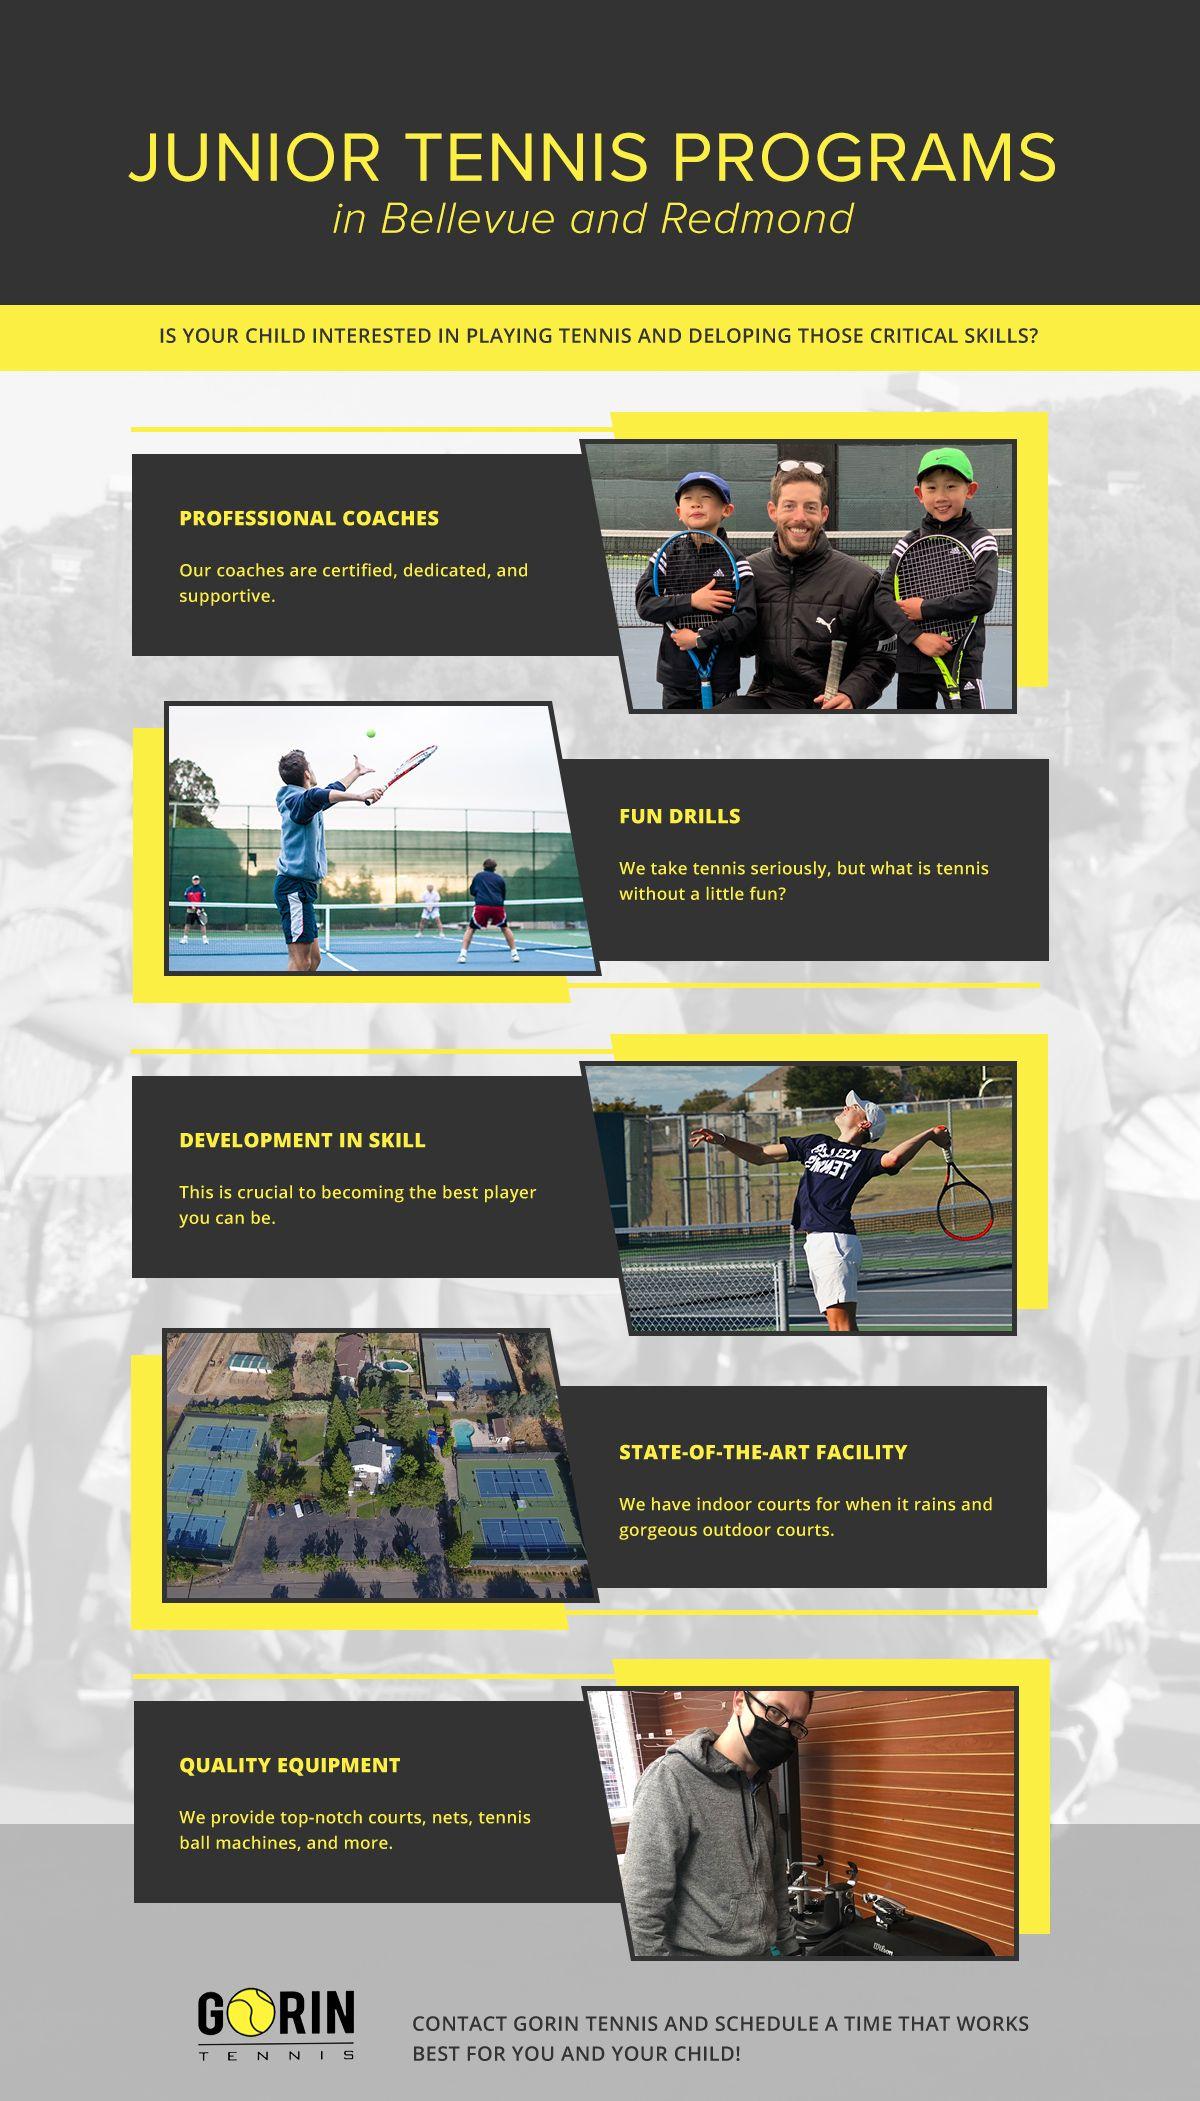 Junior-Tennis-Programs-in-Bellevue-and-Redmond-revised.jpg